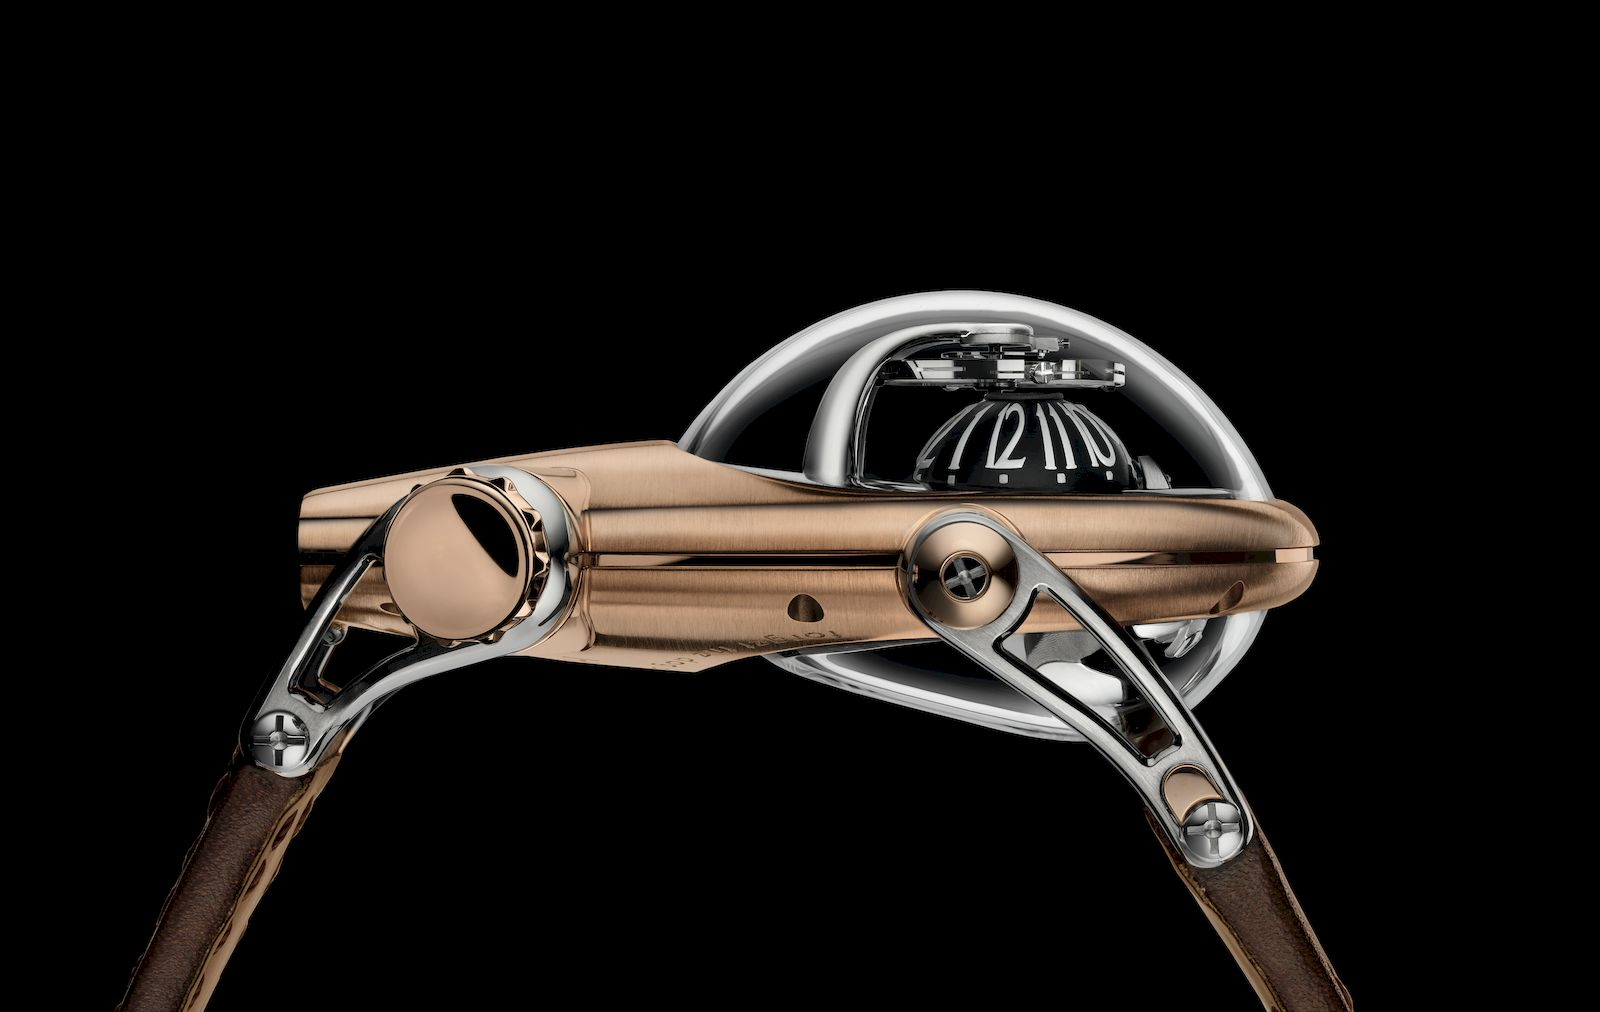 MB&F unveils a mean machine — the HM10 Bulldog